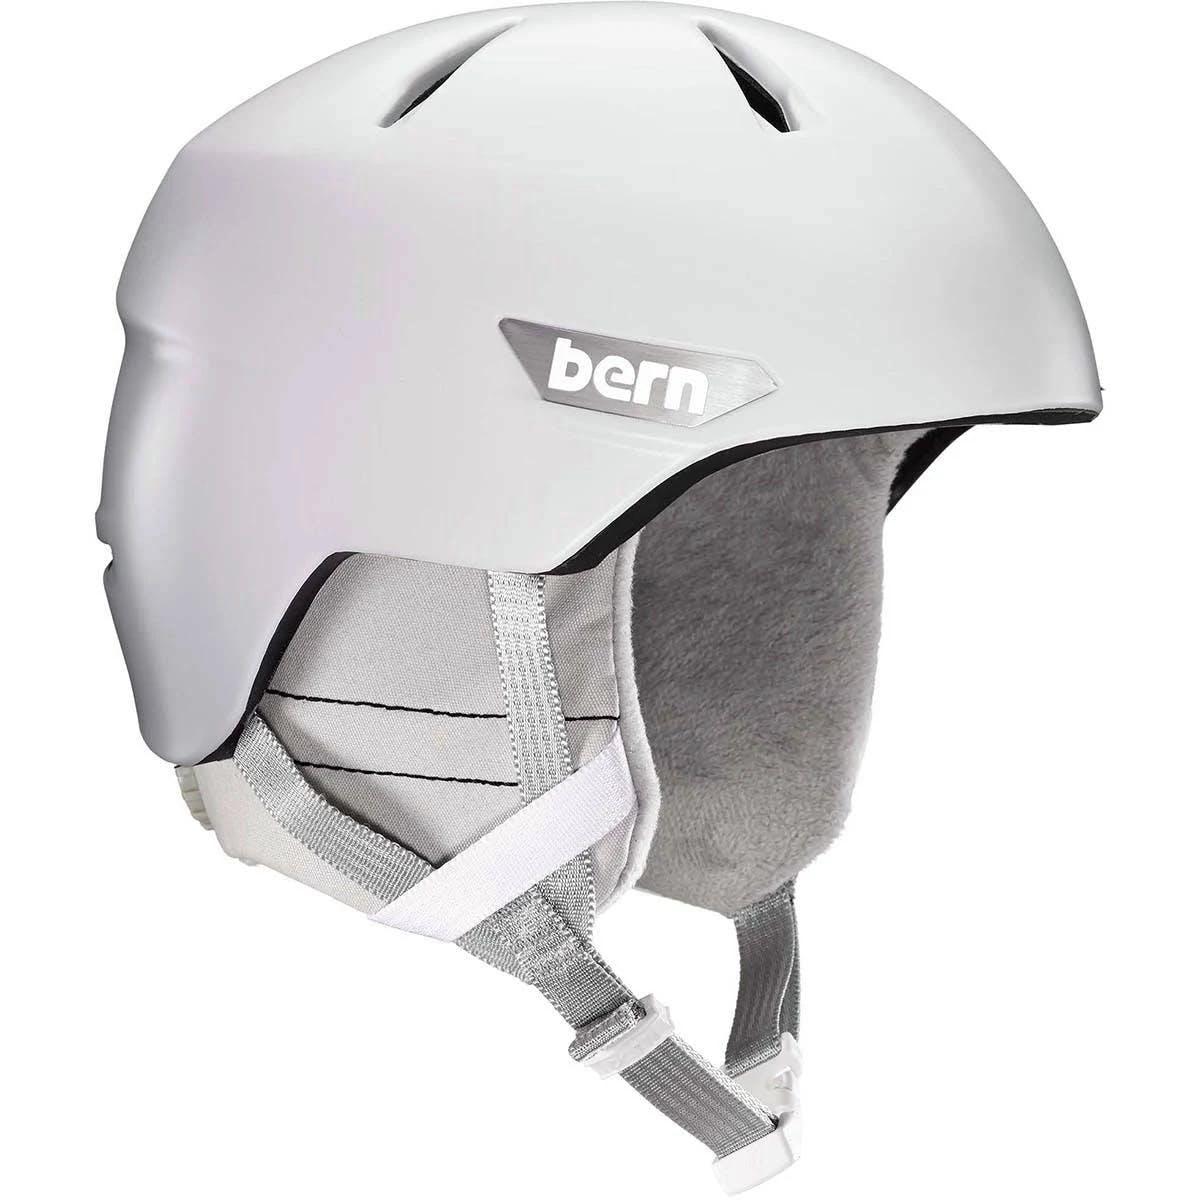 Bern Weston Helmet Satin White Large Sm10z18swt3